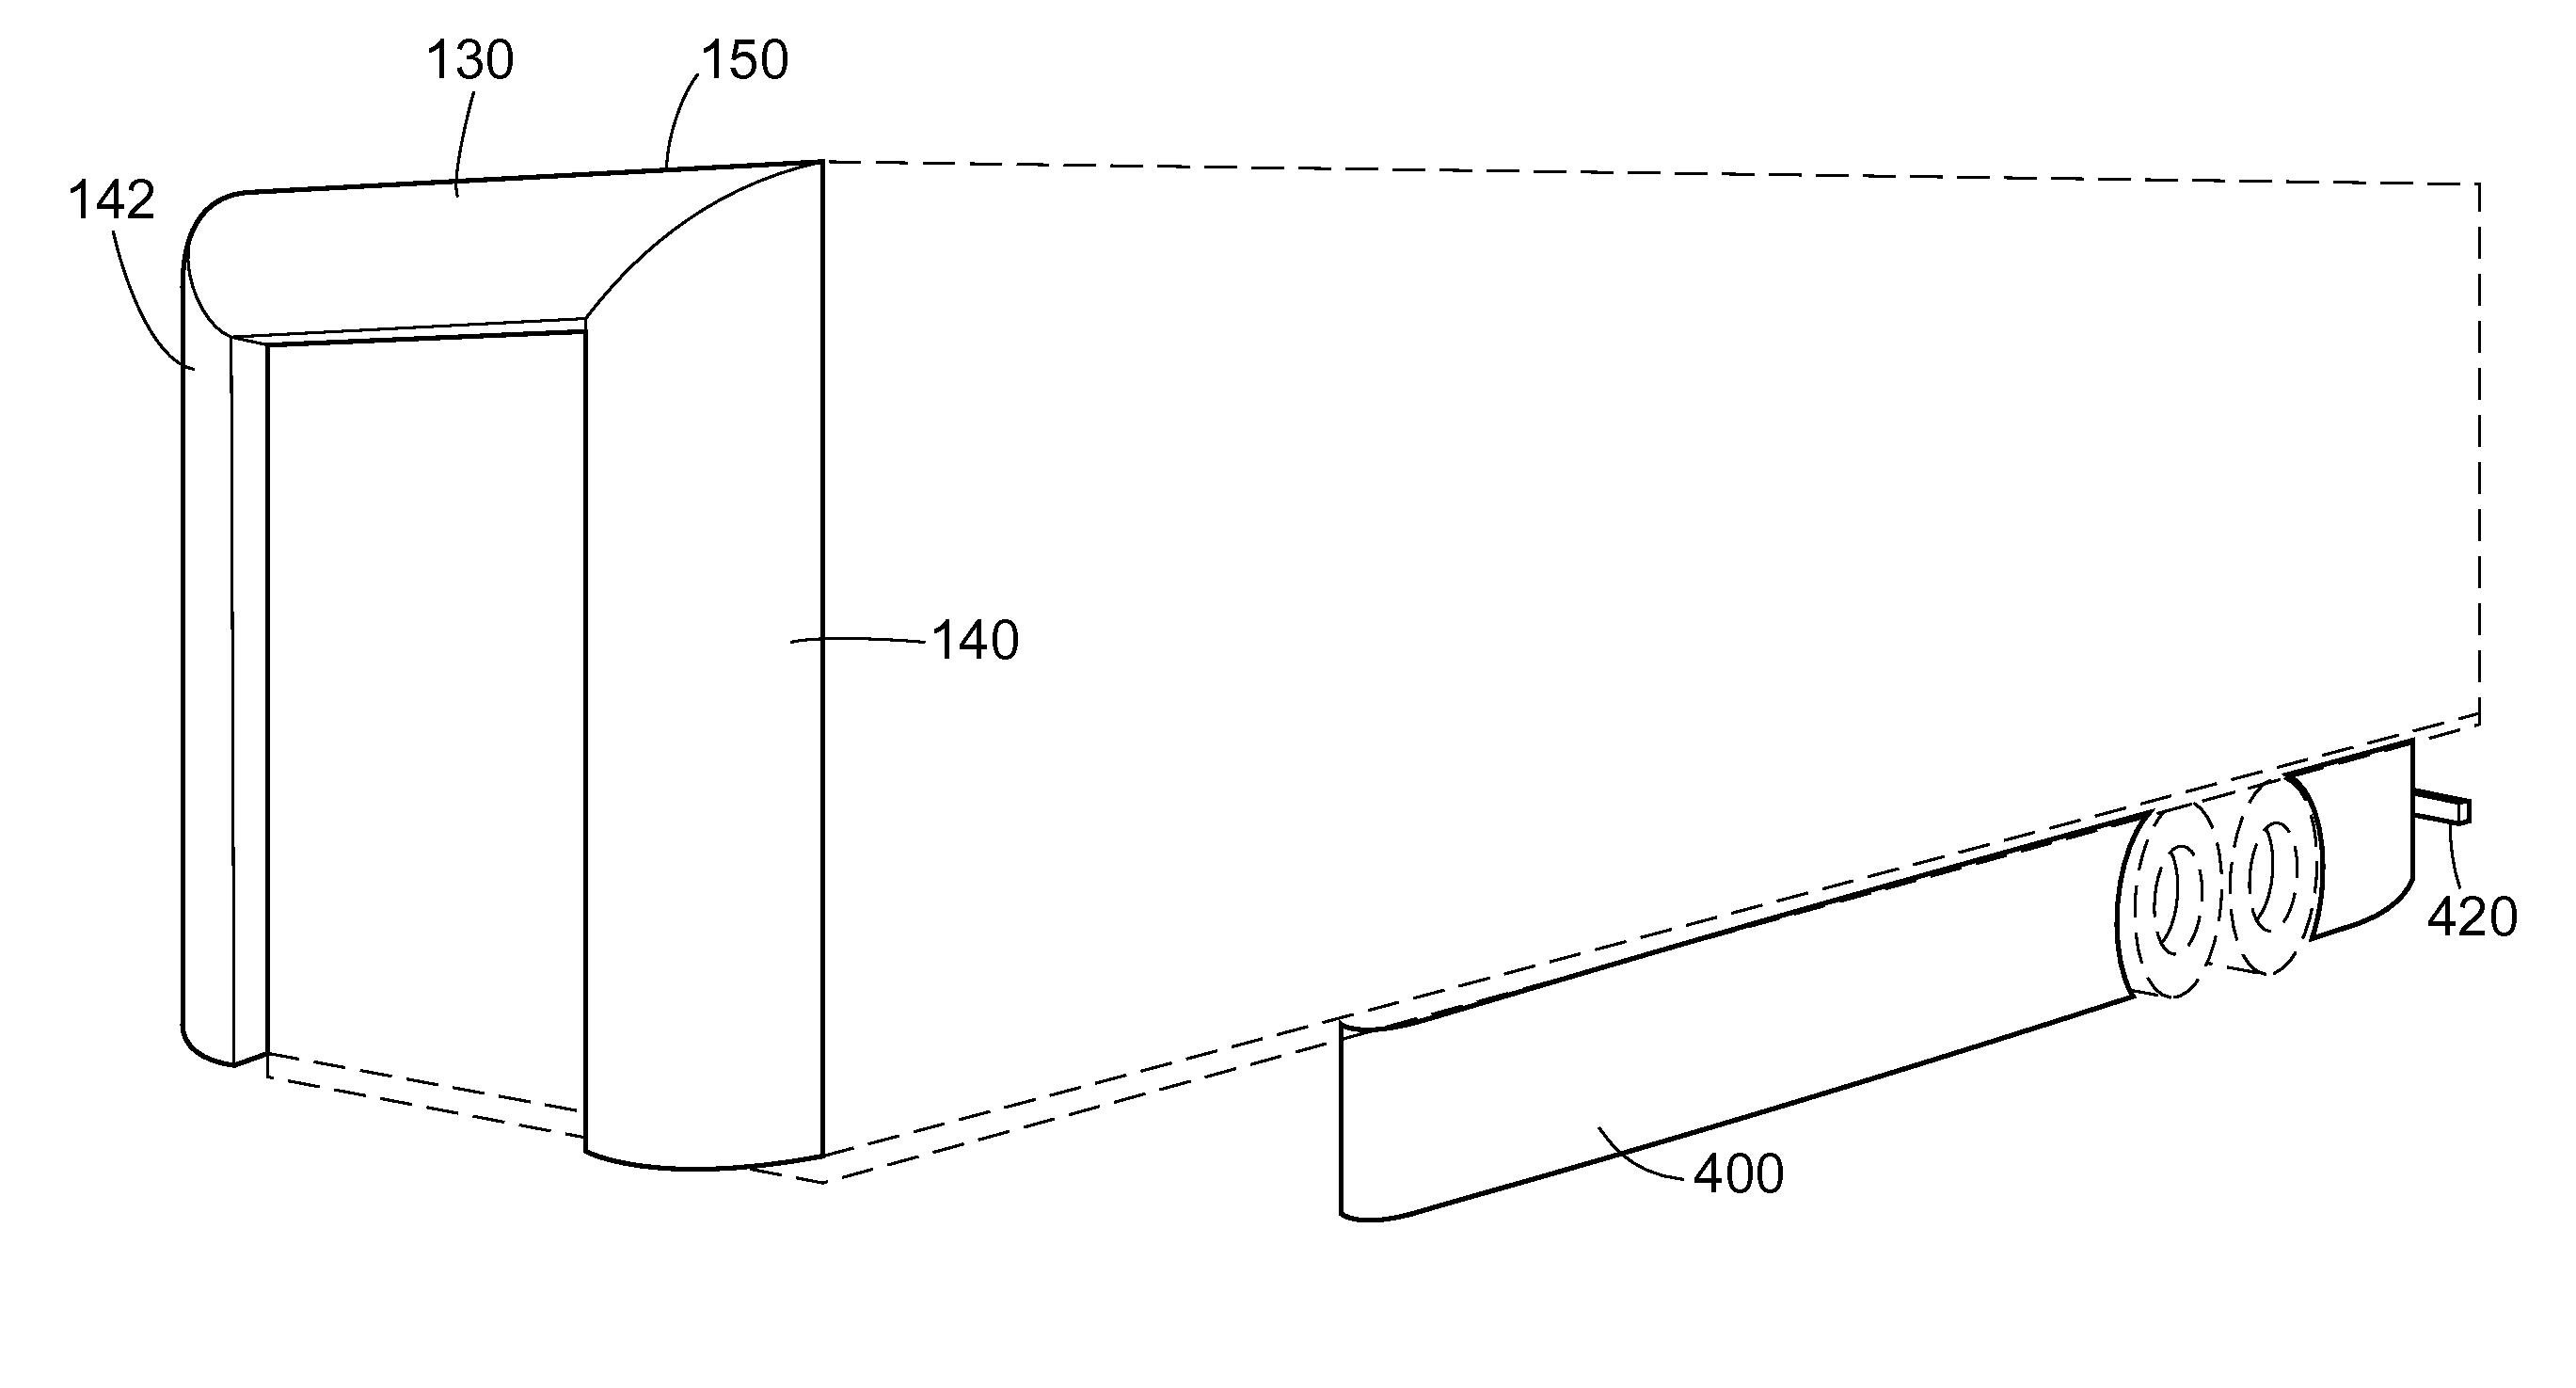 rigmaster apu wiring diagram wiring diagram website